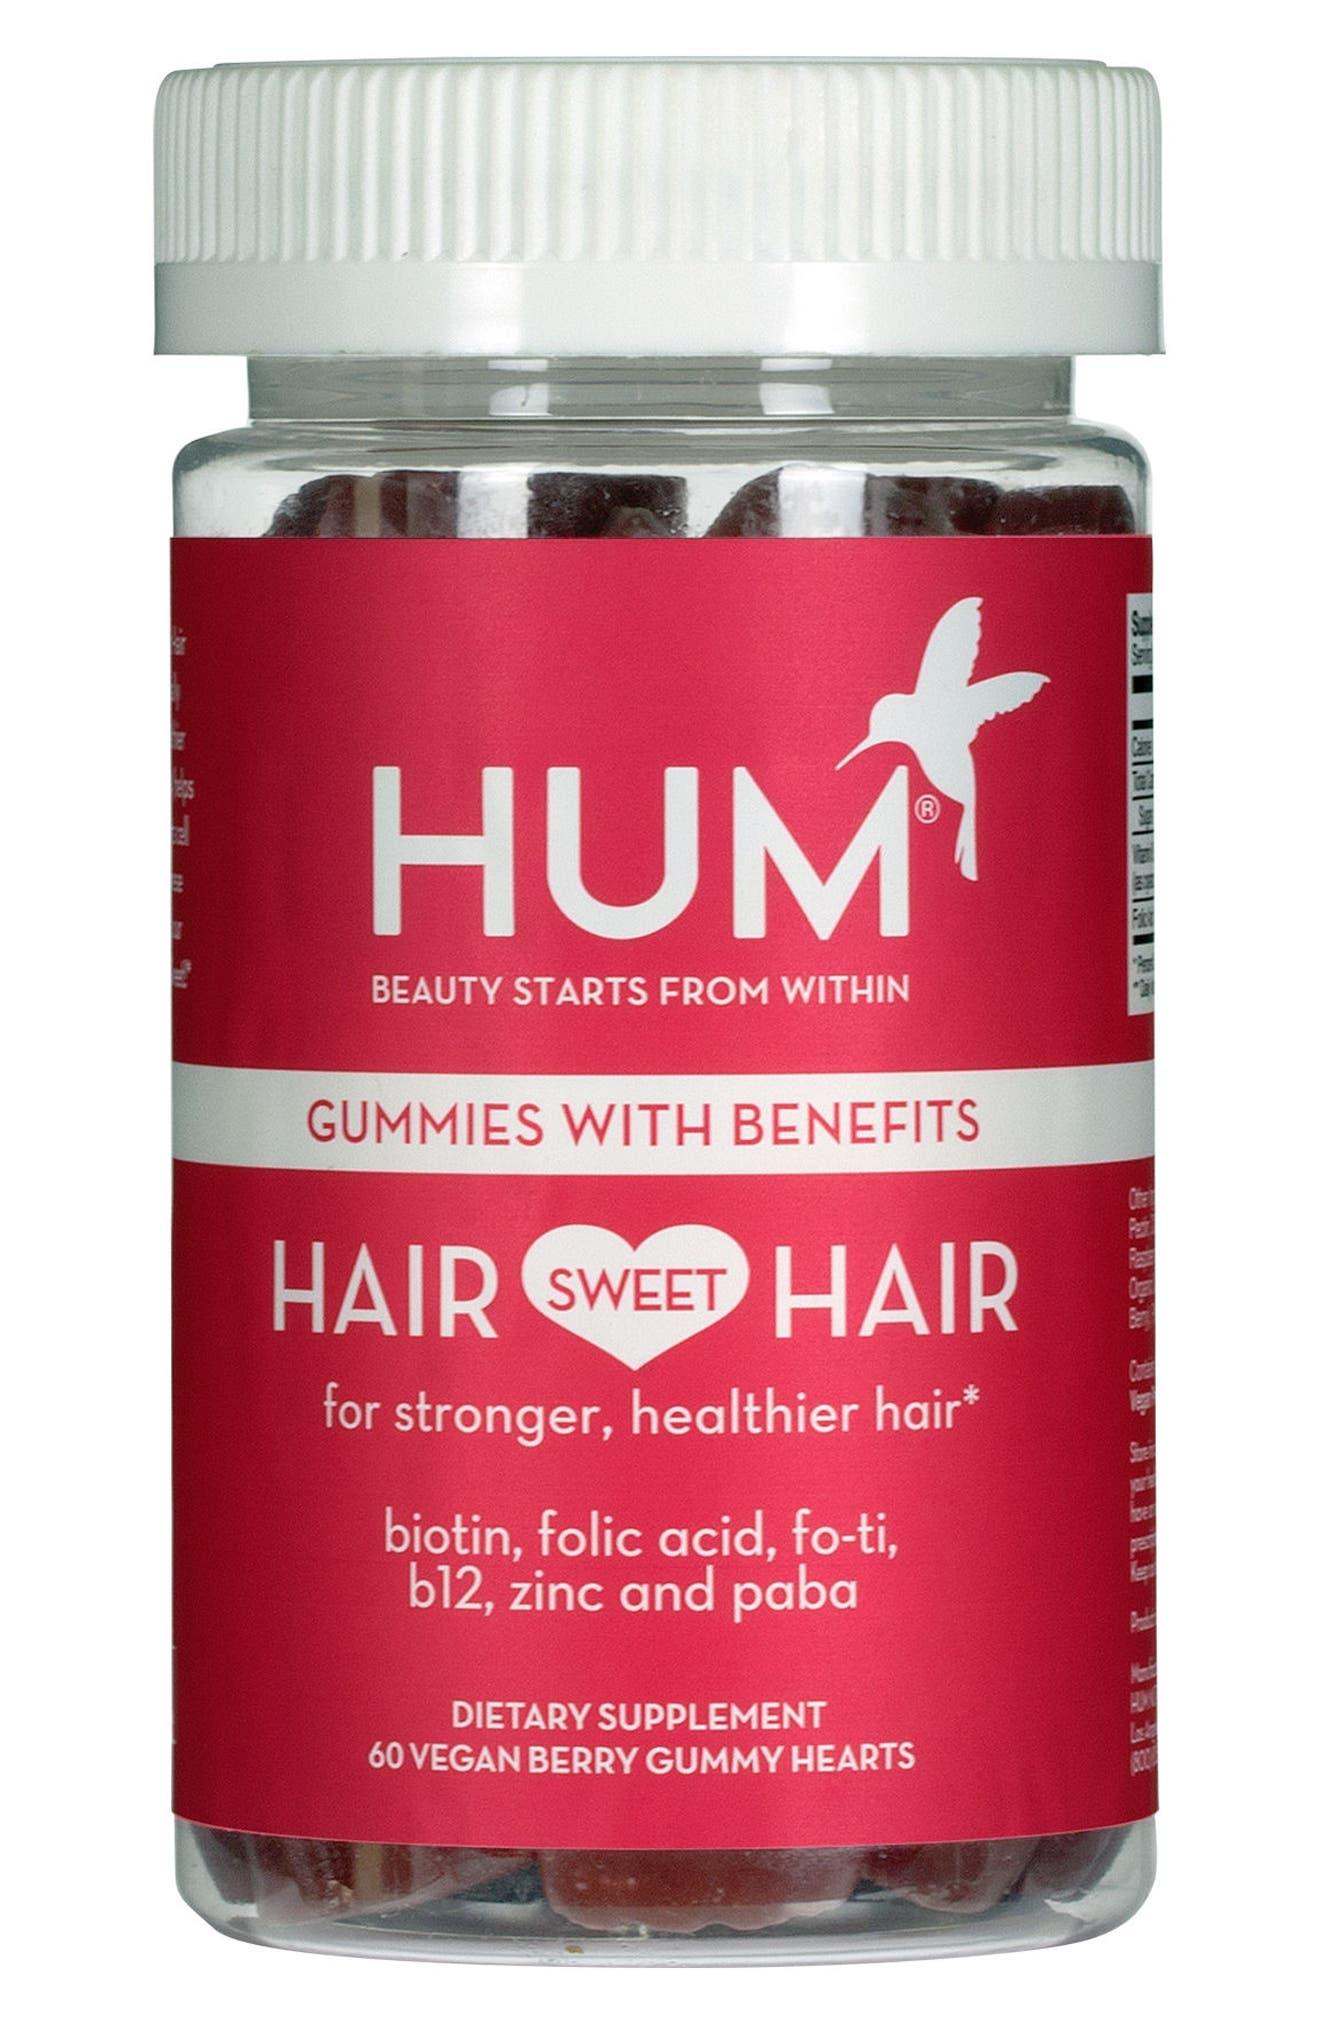 Hair Sweet Hair Gummies Supplement for Healthy Hair,                         Main,                         color, NO COLOR